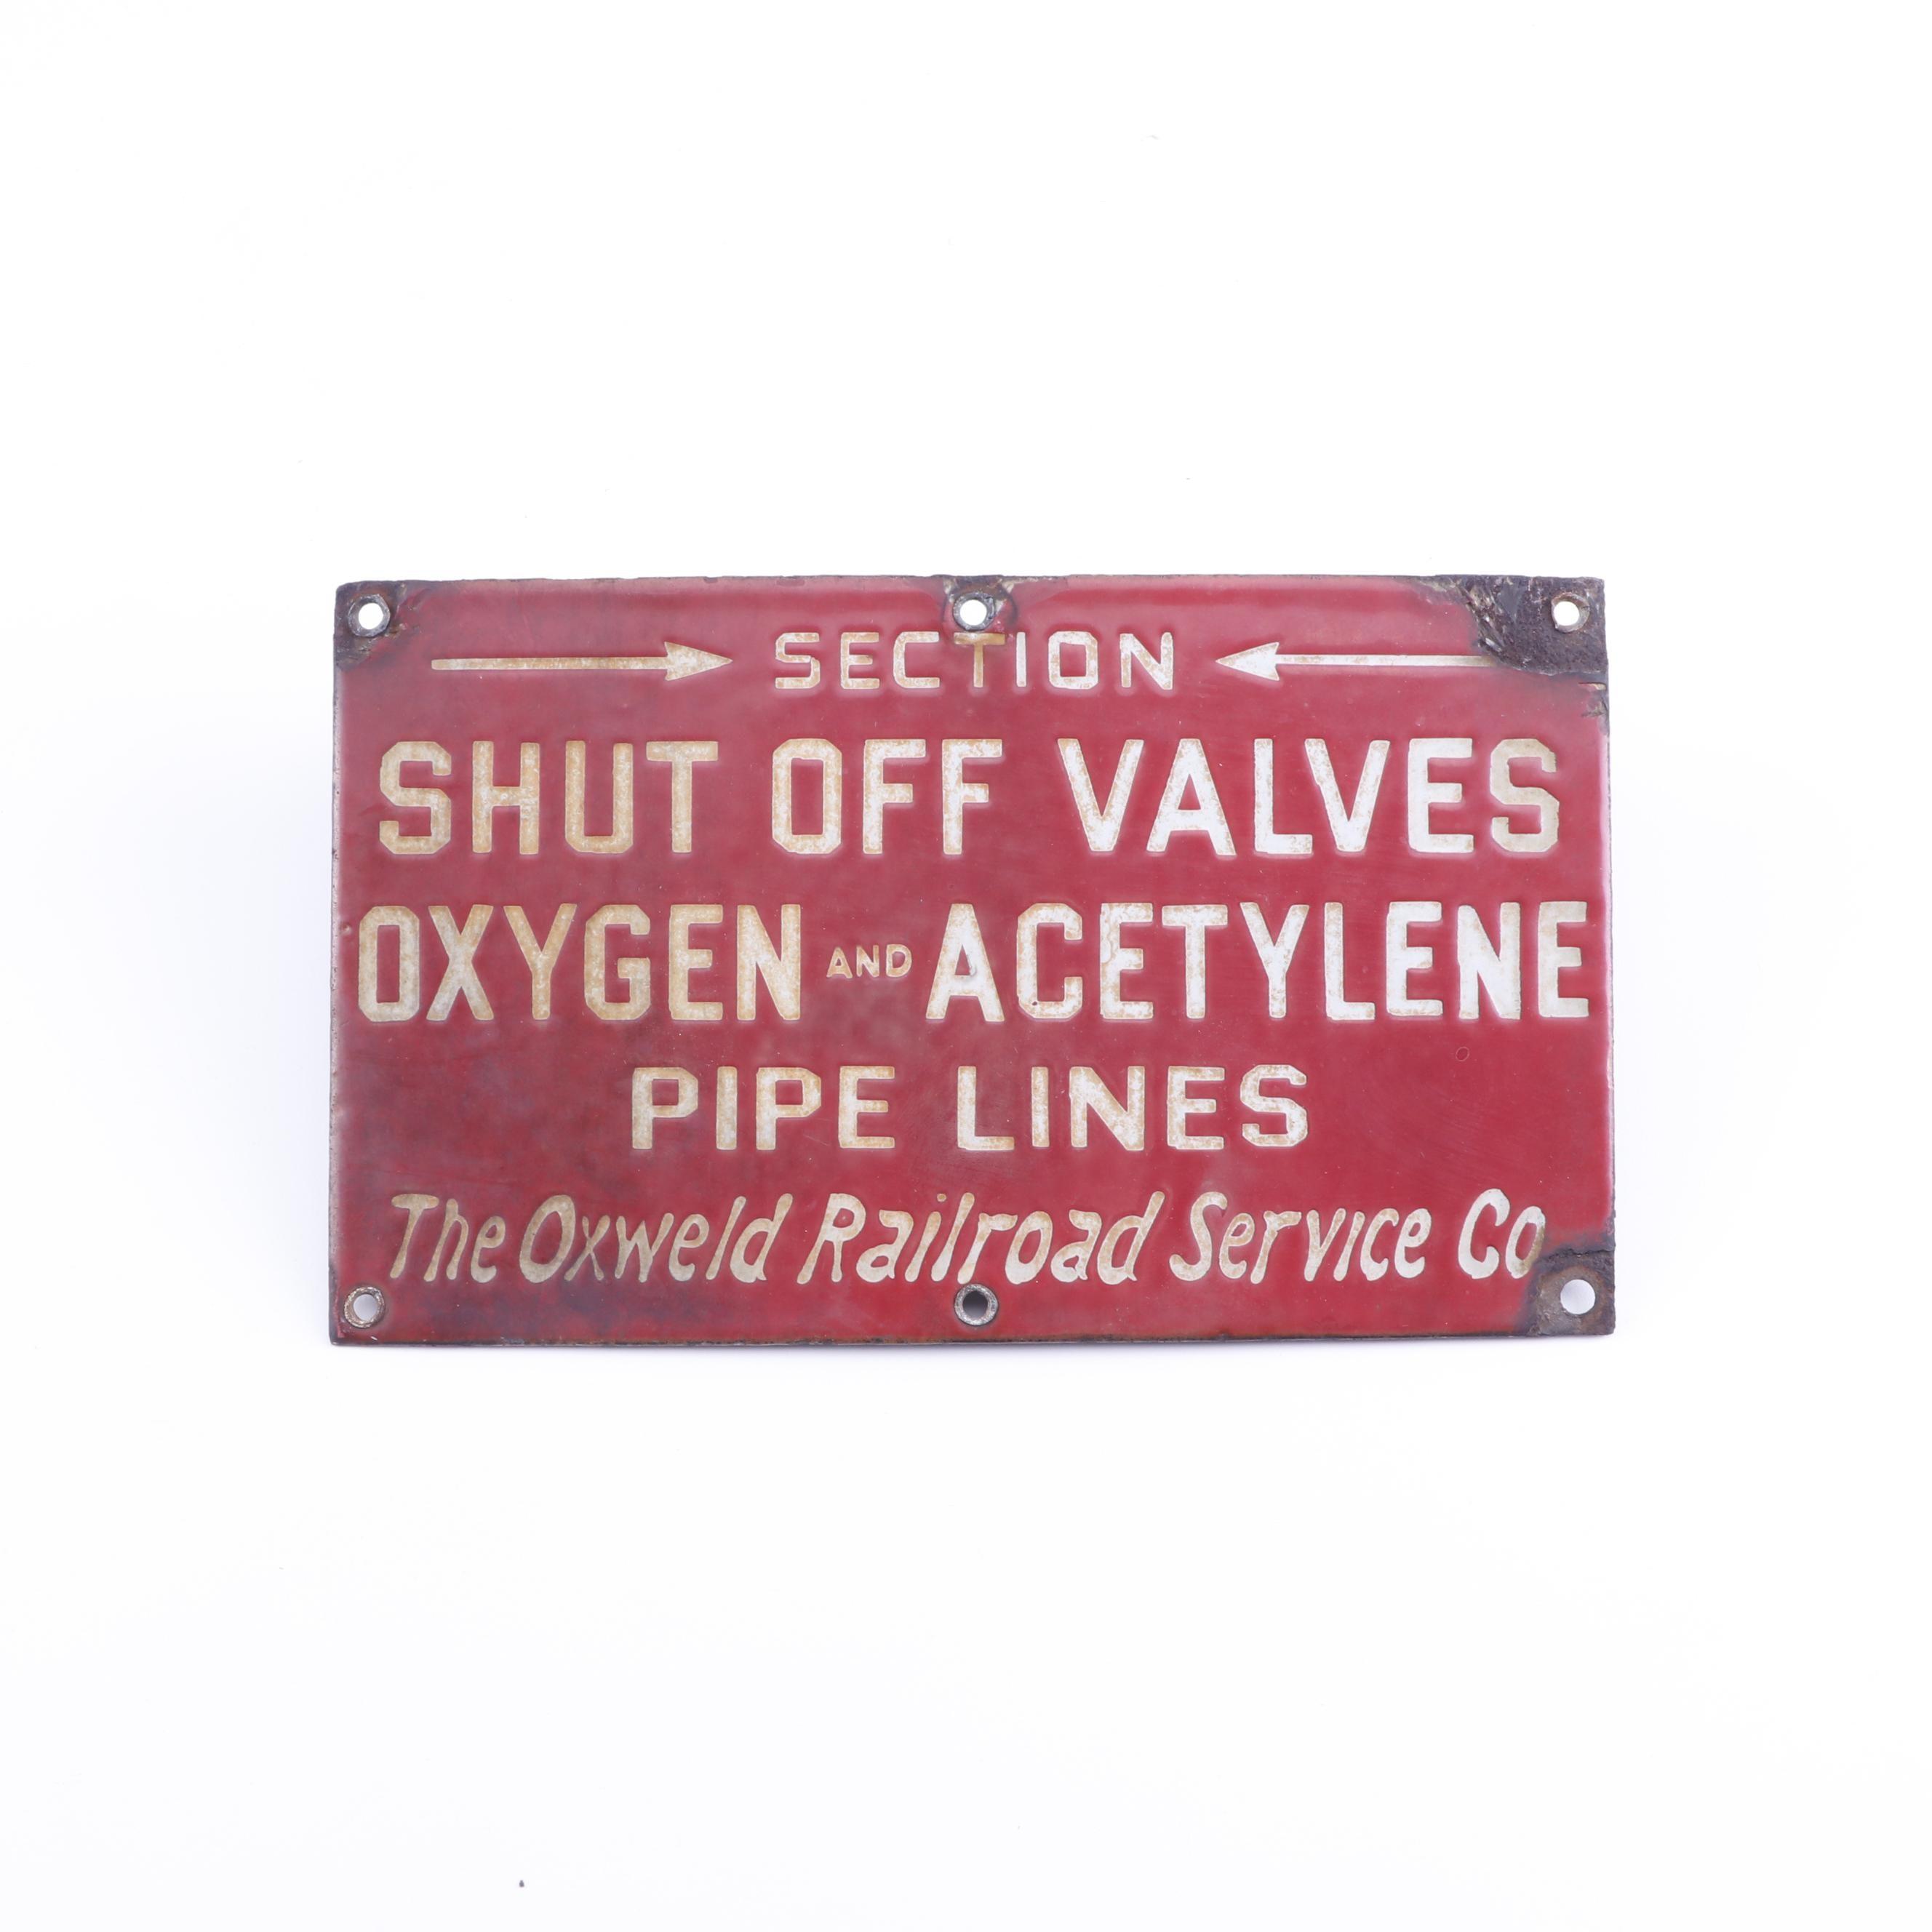 Oxweld Railroad Service Co. Porcelain Enamel Sign